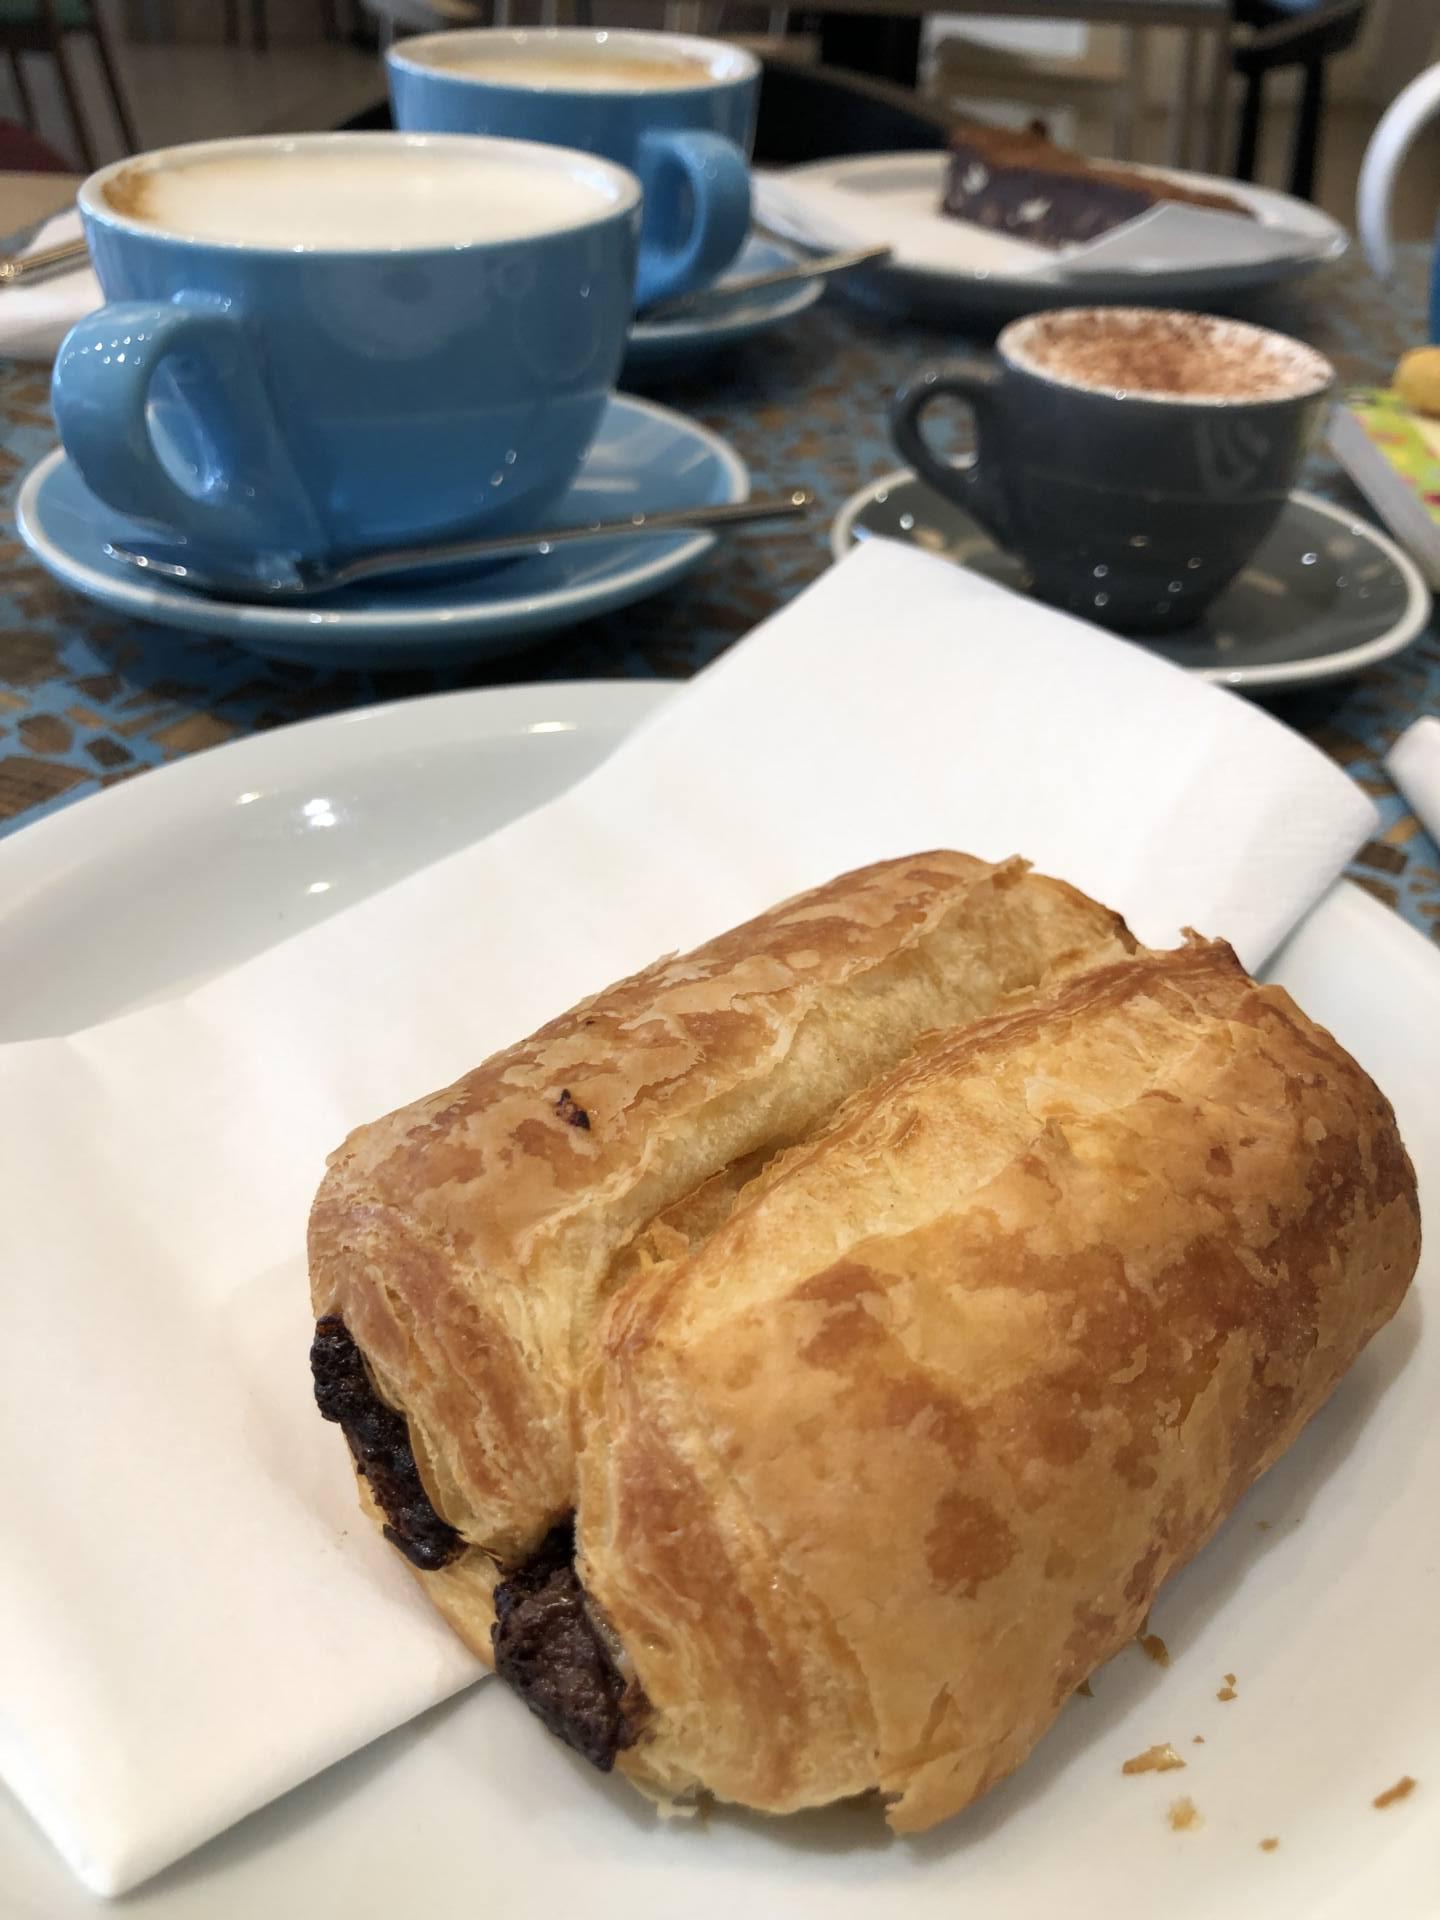 Midlands Art Centre (MAC) - Birmingham pain au chocolat